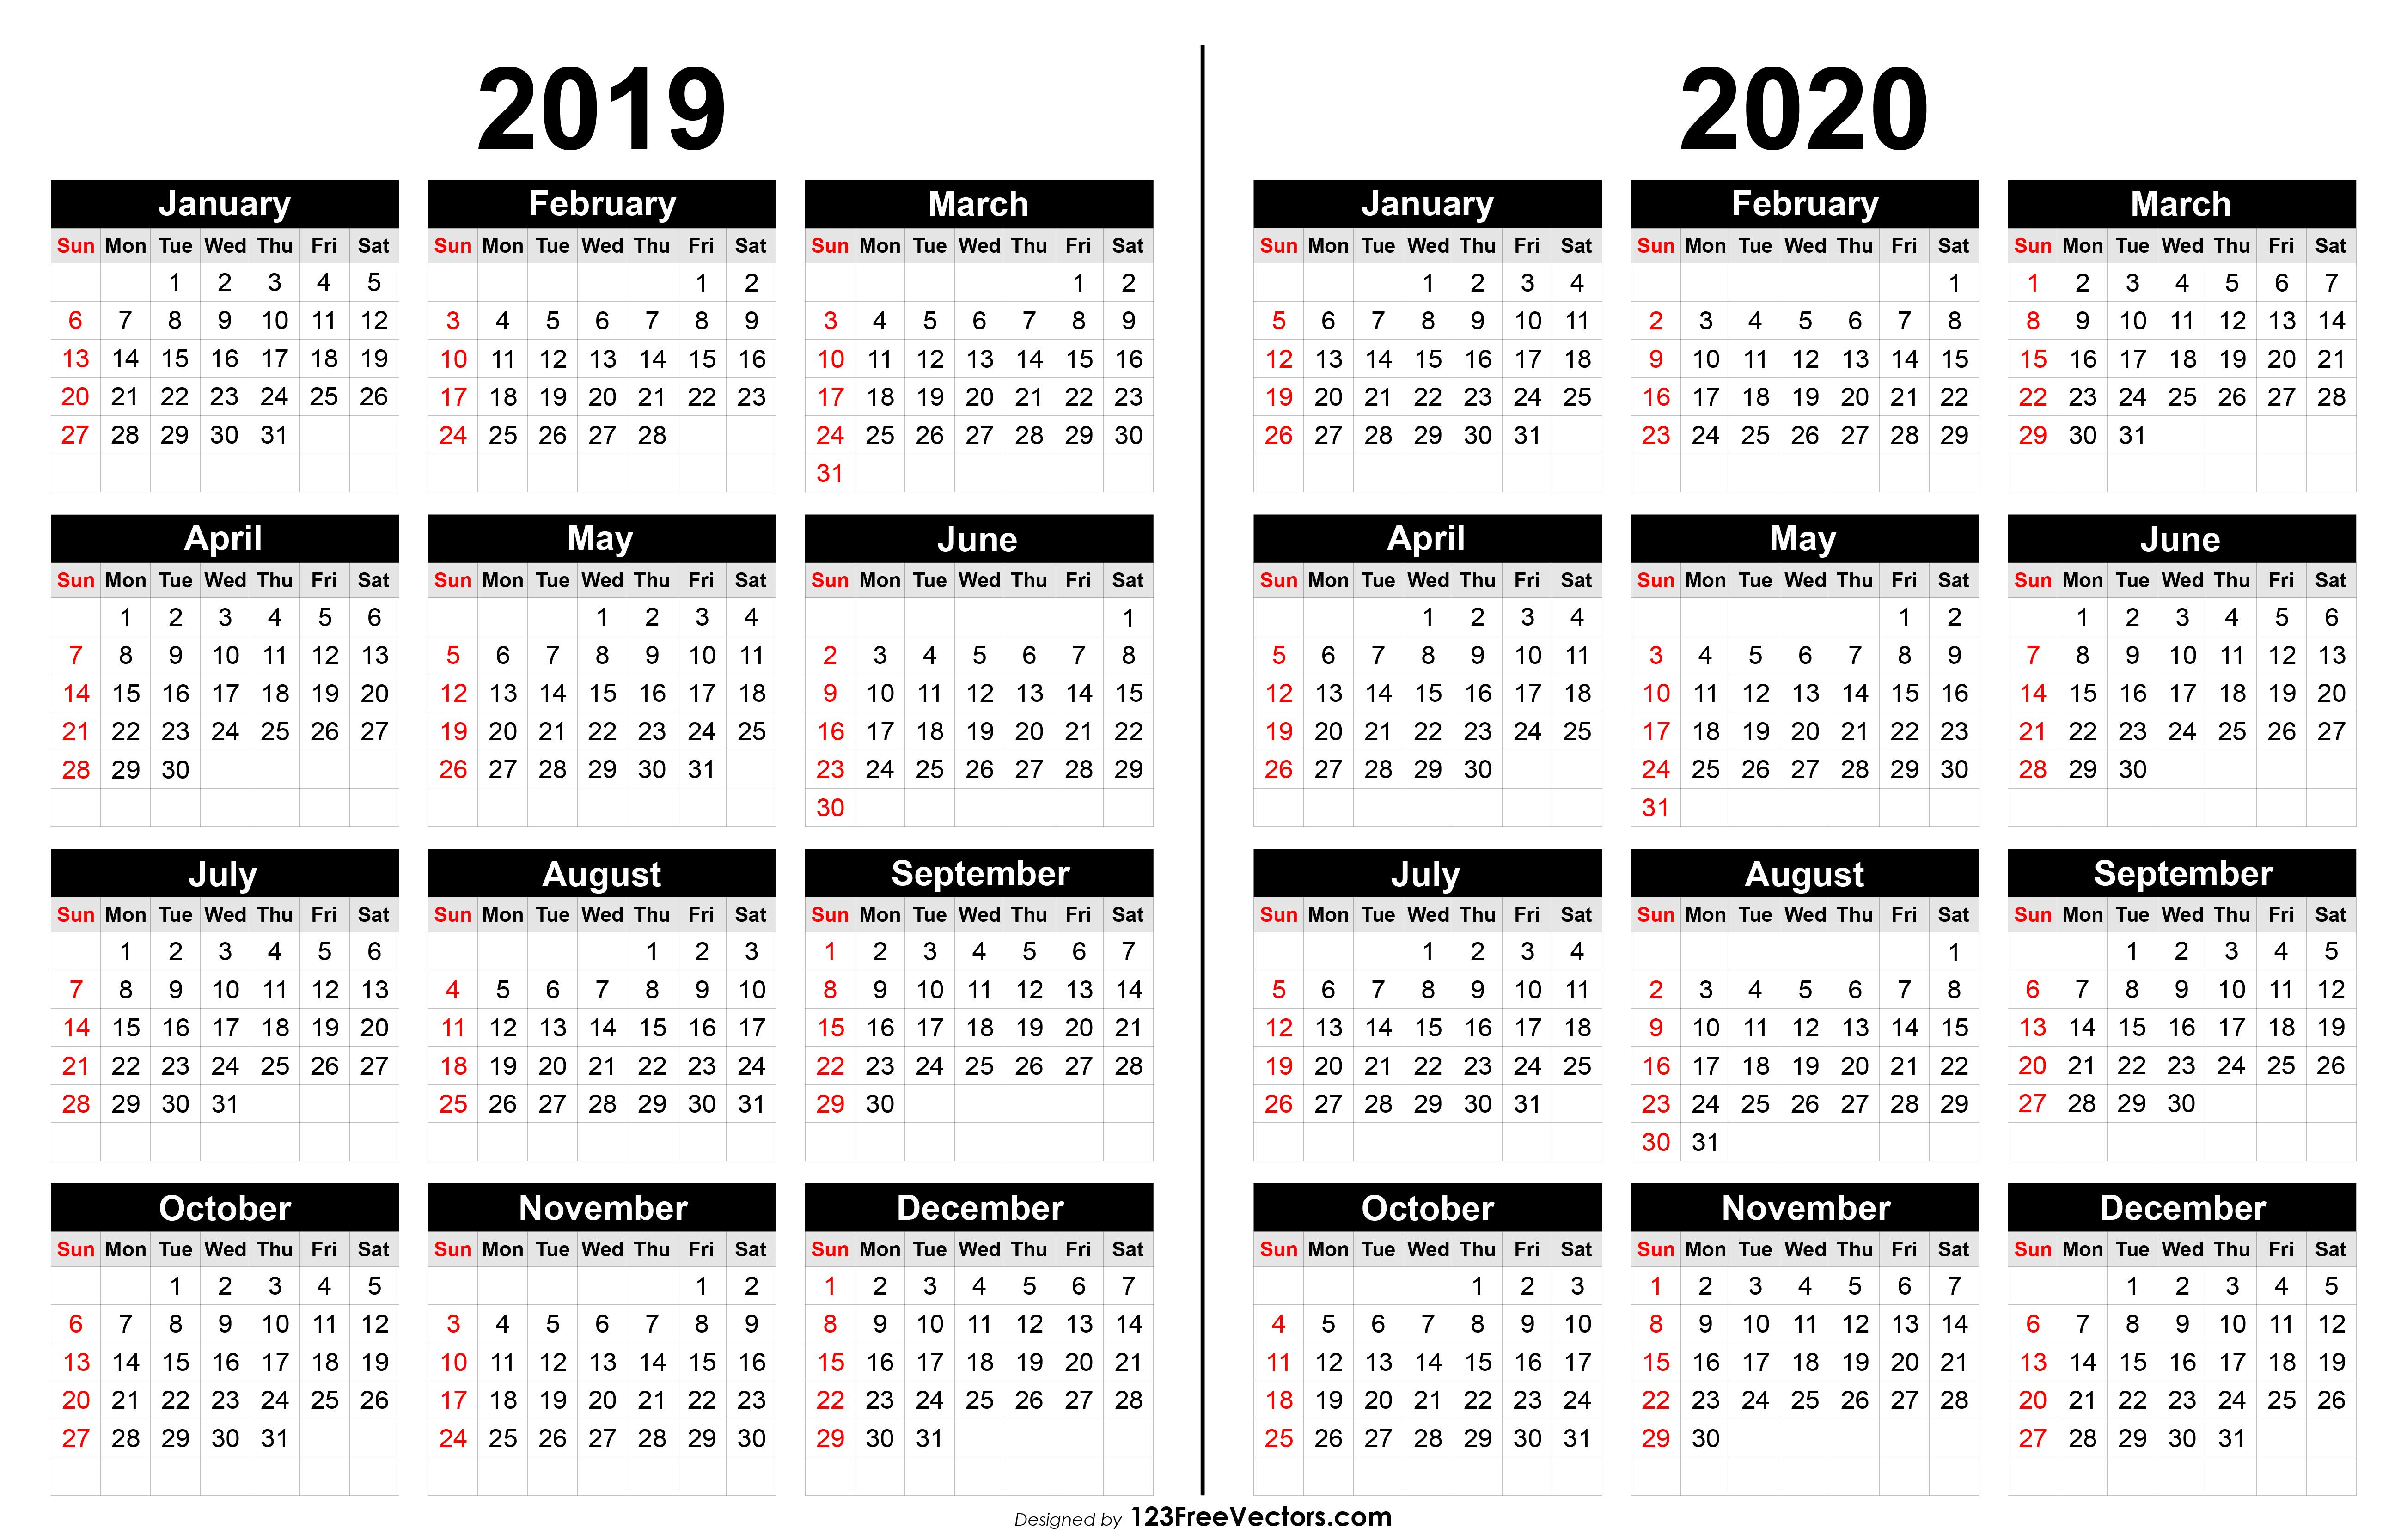 2020 Calendar Template Illustrator